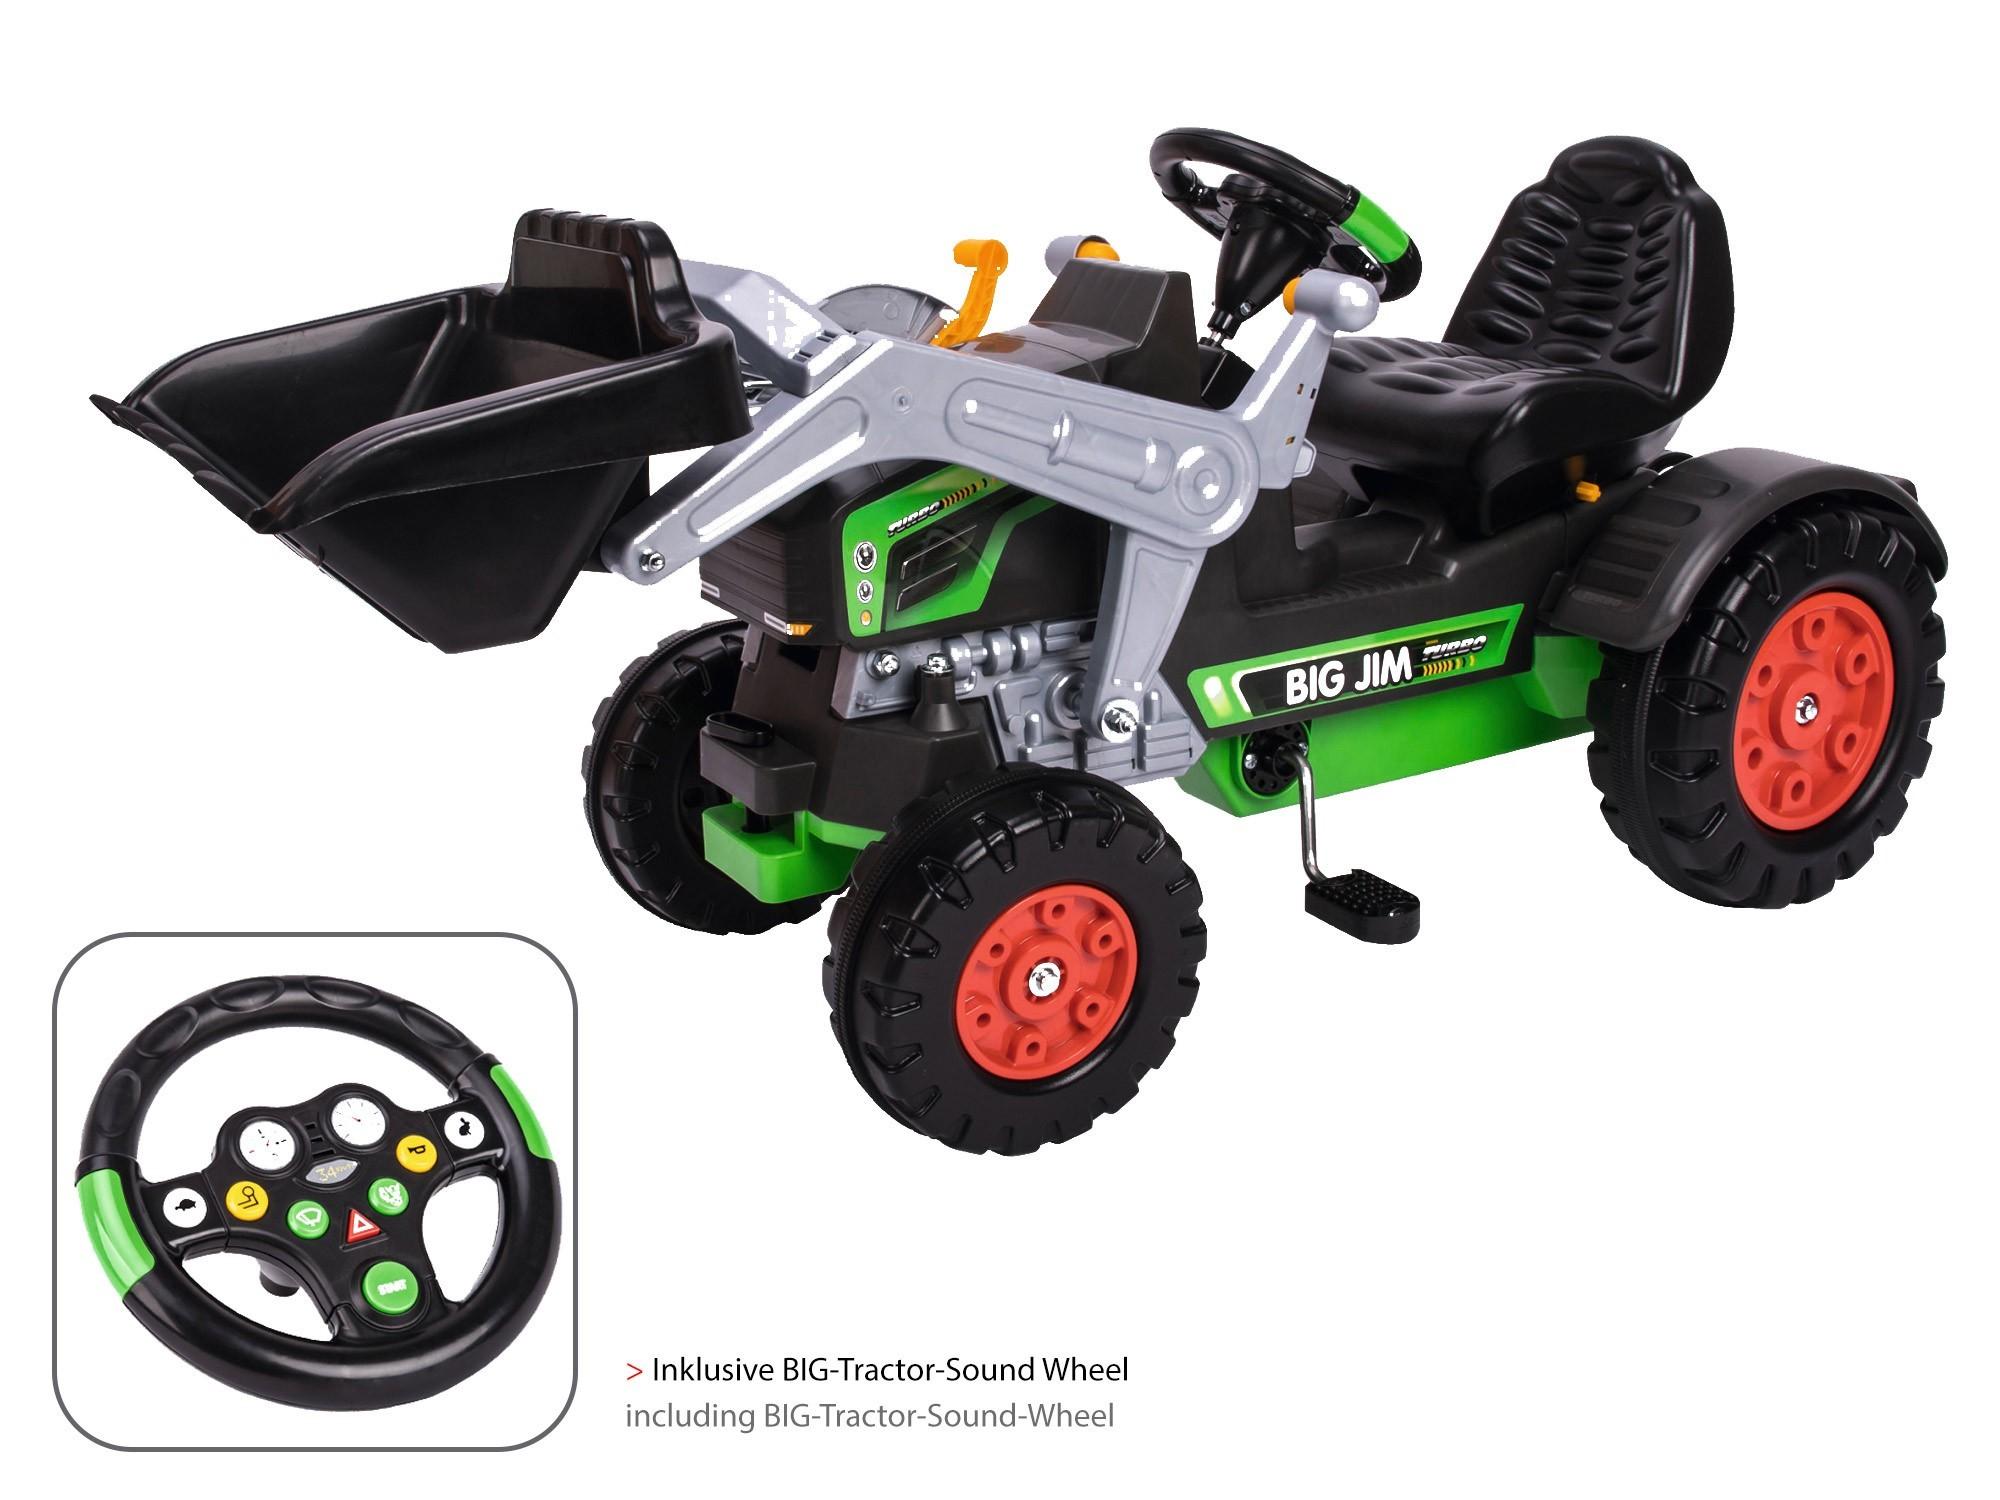 BIG Jim-Turbo Traktor für Kinder Bild 1